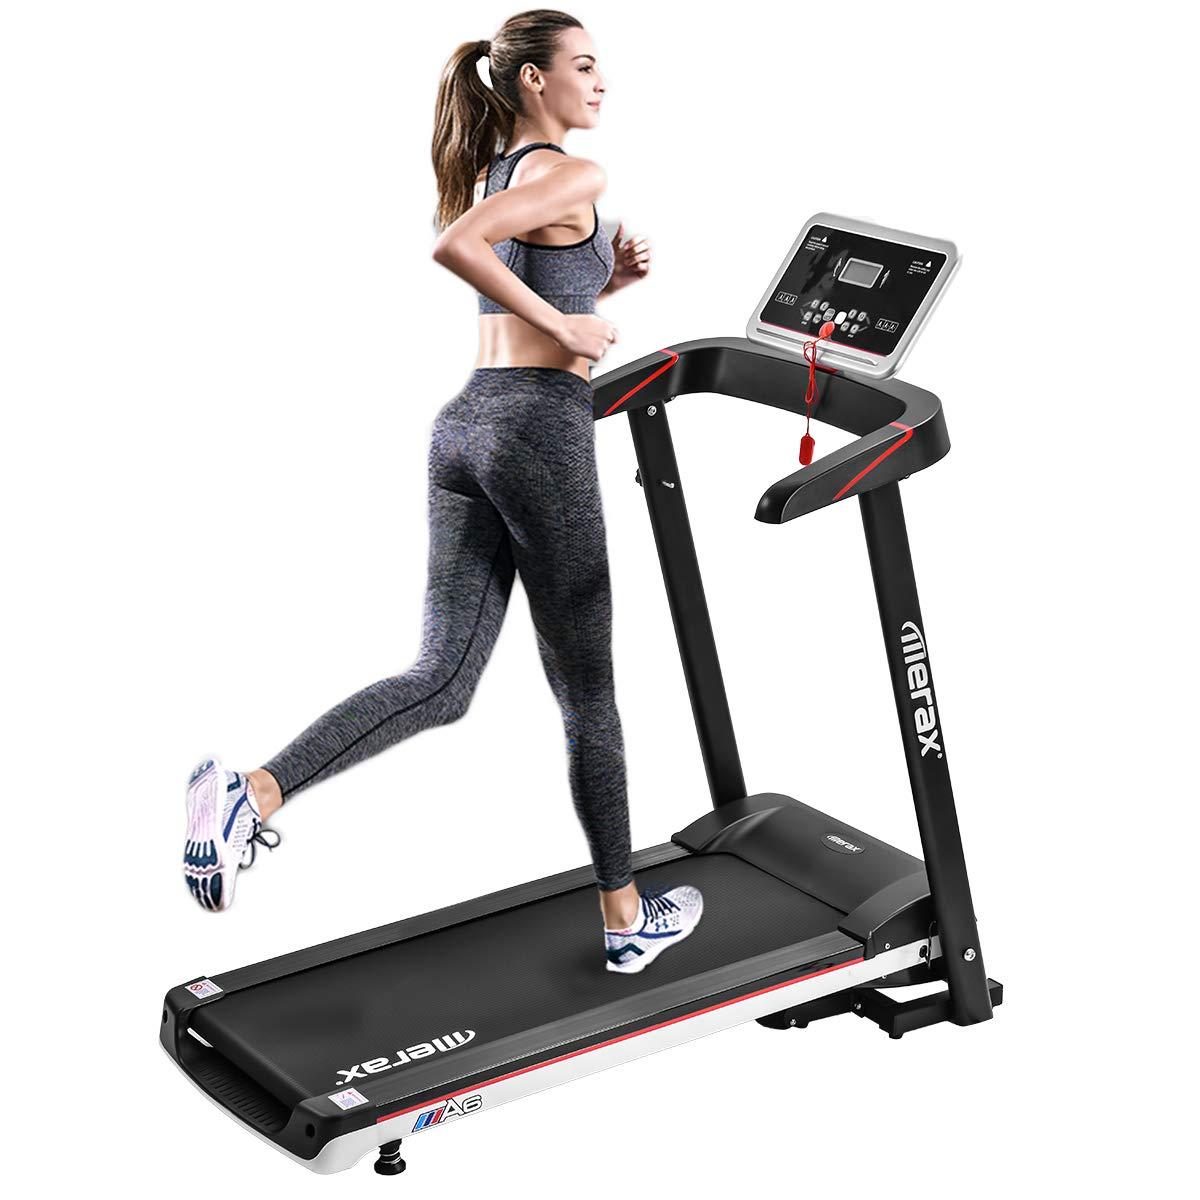 P PURLOVE Treadmill Folding Electric Treadmill Power Motorized Running Machine Treadly Treadmill for Running